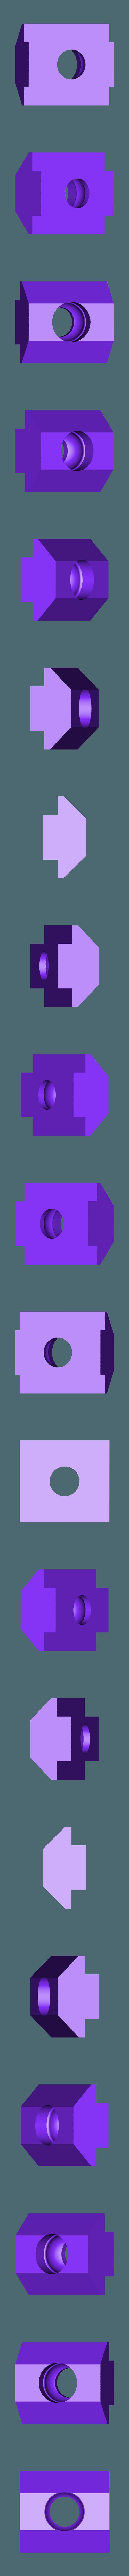 Magentic_TNut_5mm_Ball_v1-0.STL Download free STL file Magnetic T-Nut • 3D print model, WalterHsiao